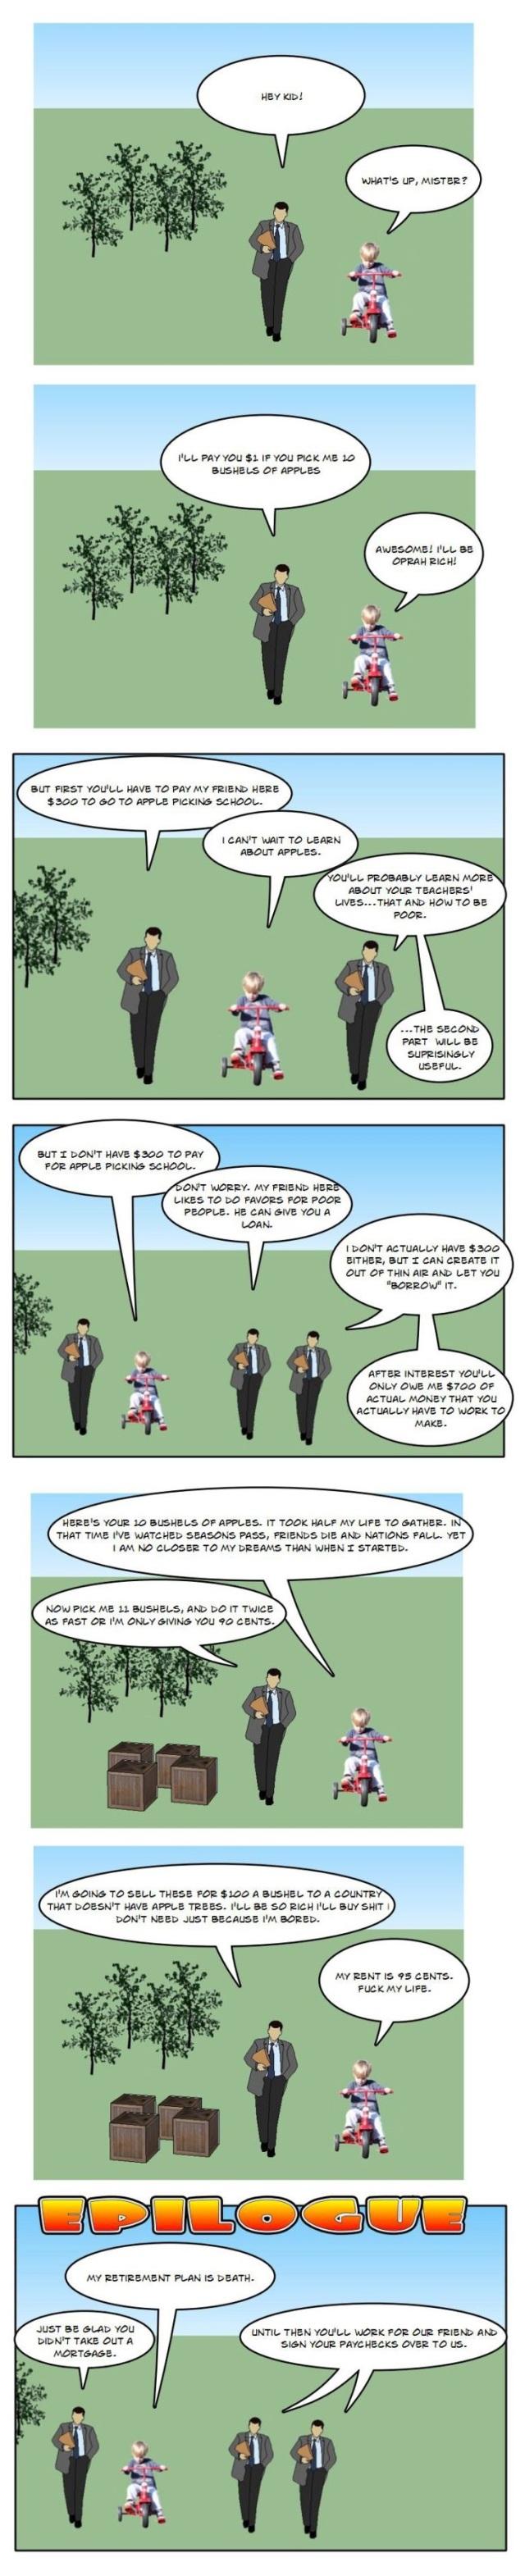 (Comic) How The Economy Works